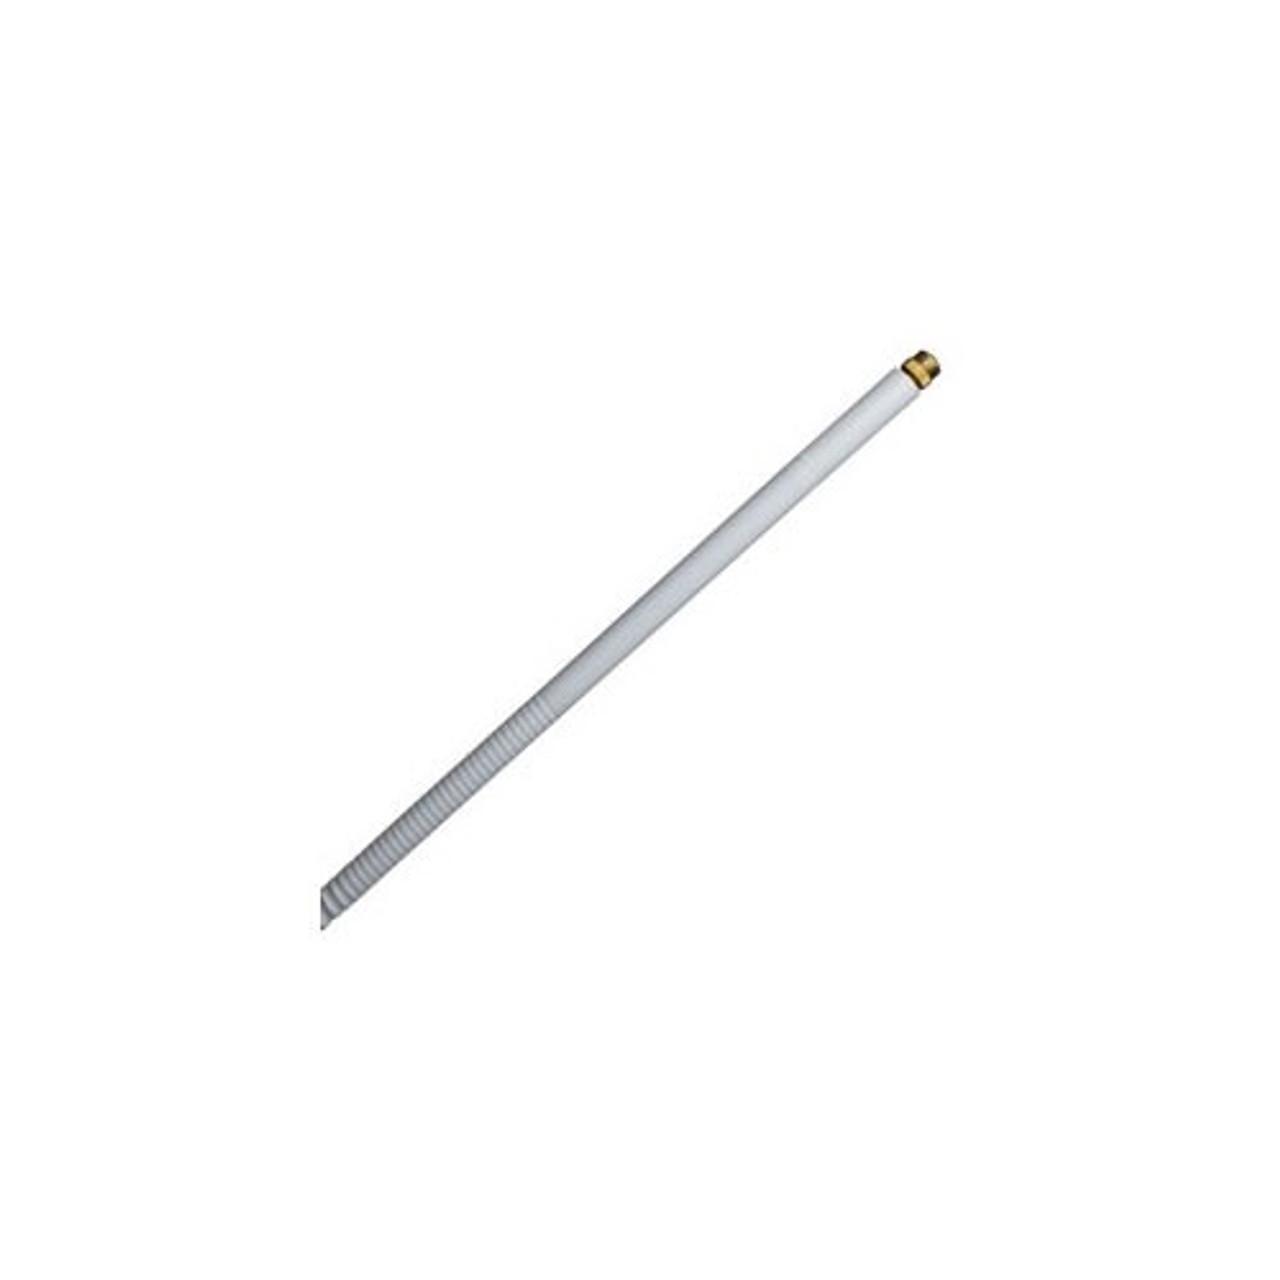 4 Foot Firestik II FS Series Tunable Tip CB Antenna - White